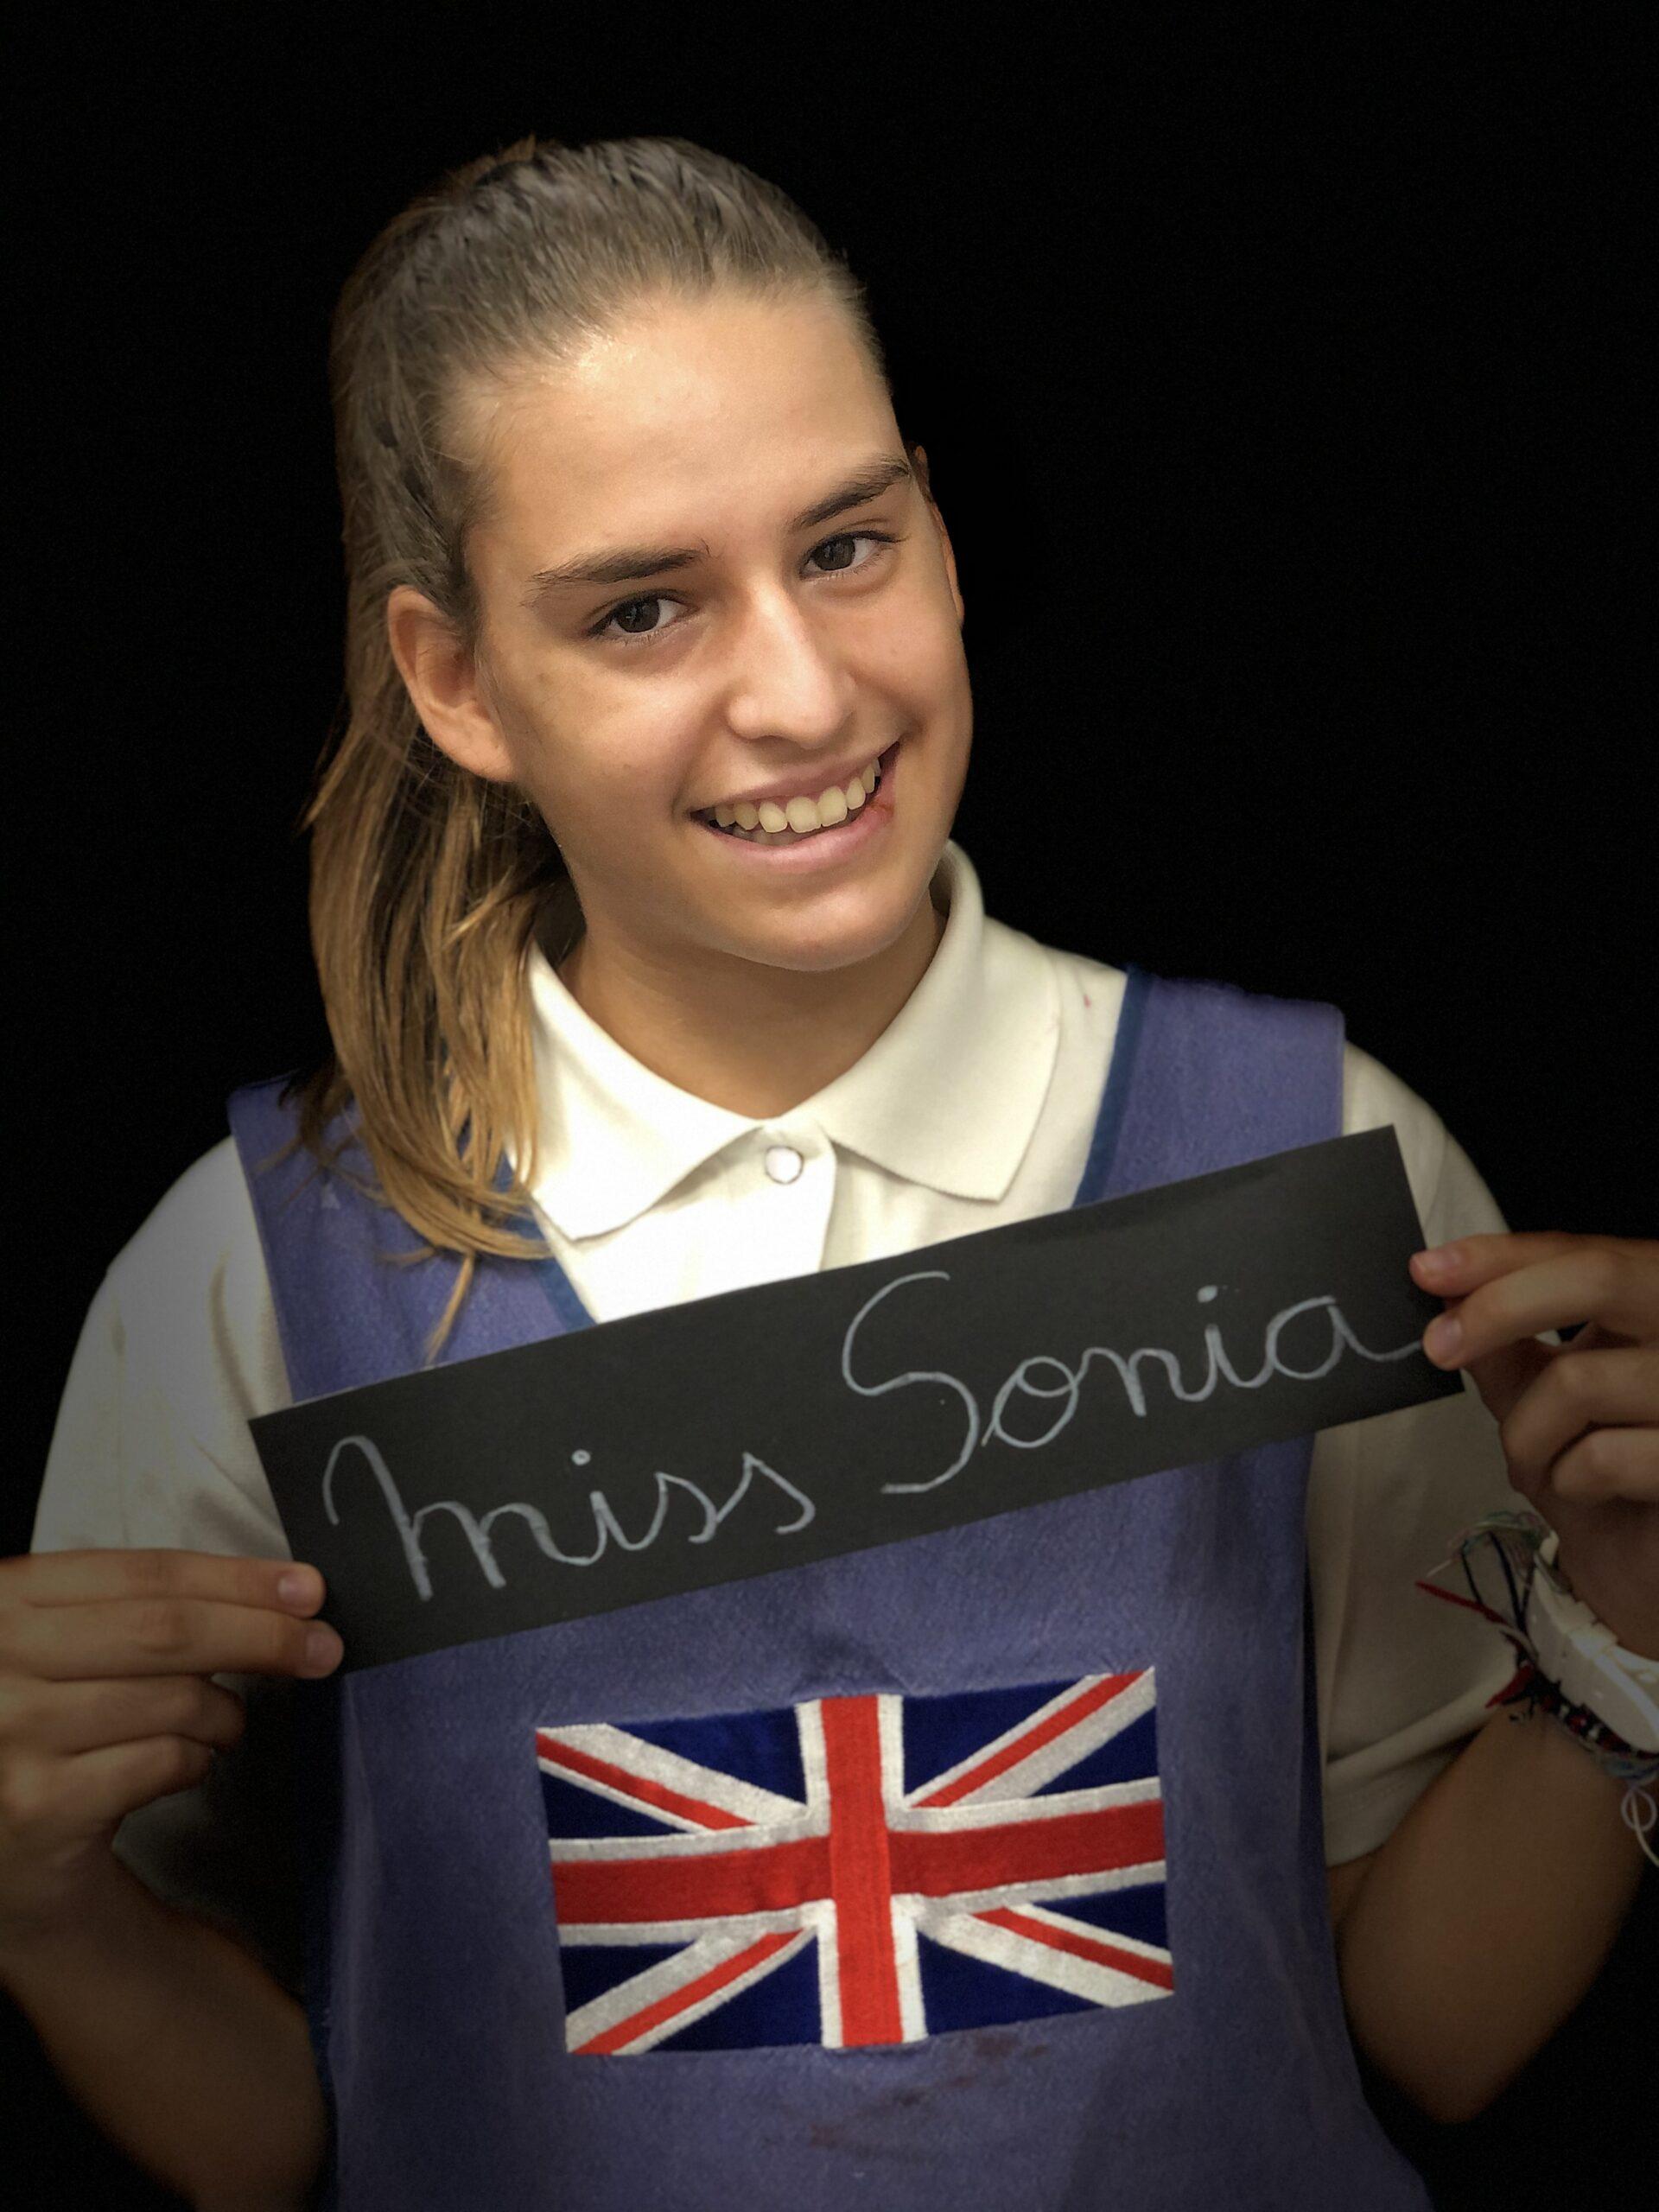 Miss Sonia